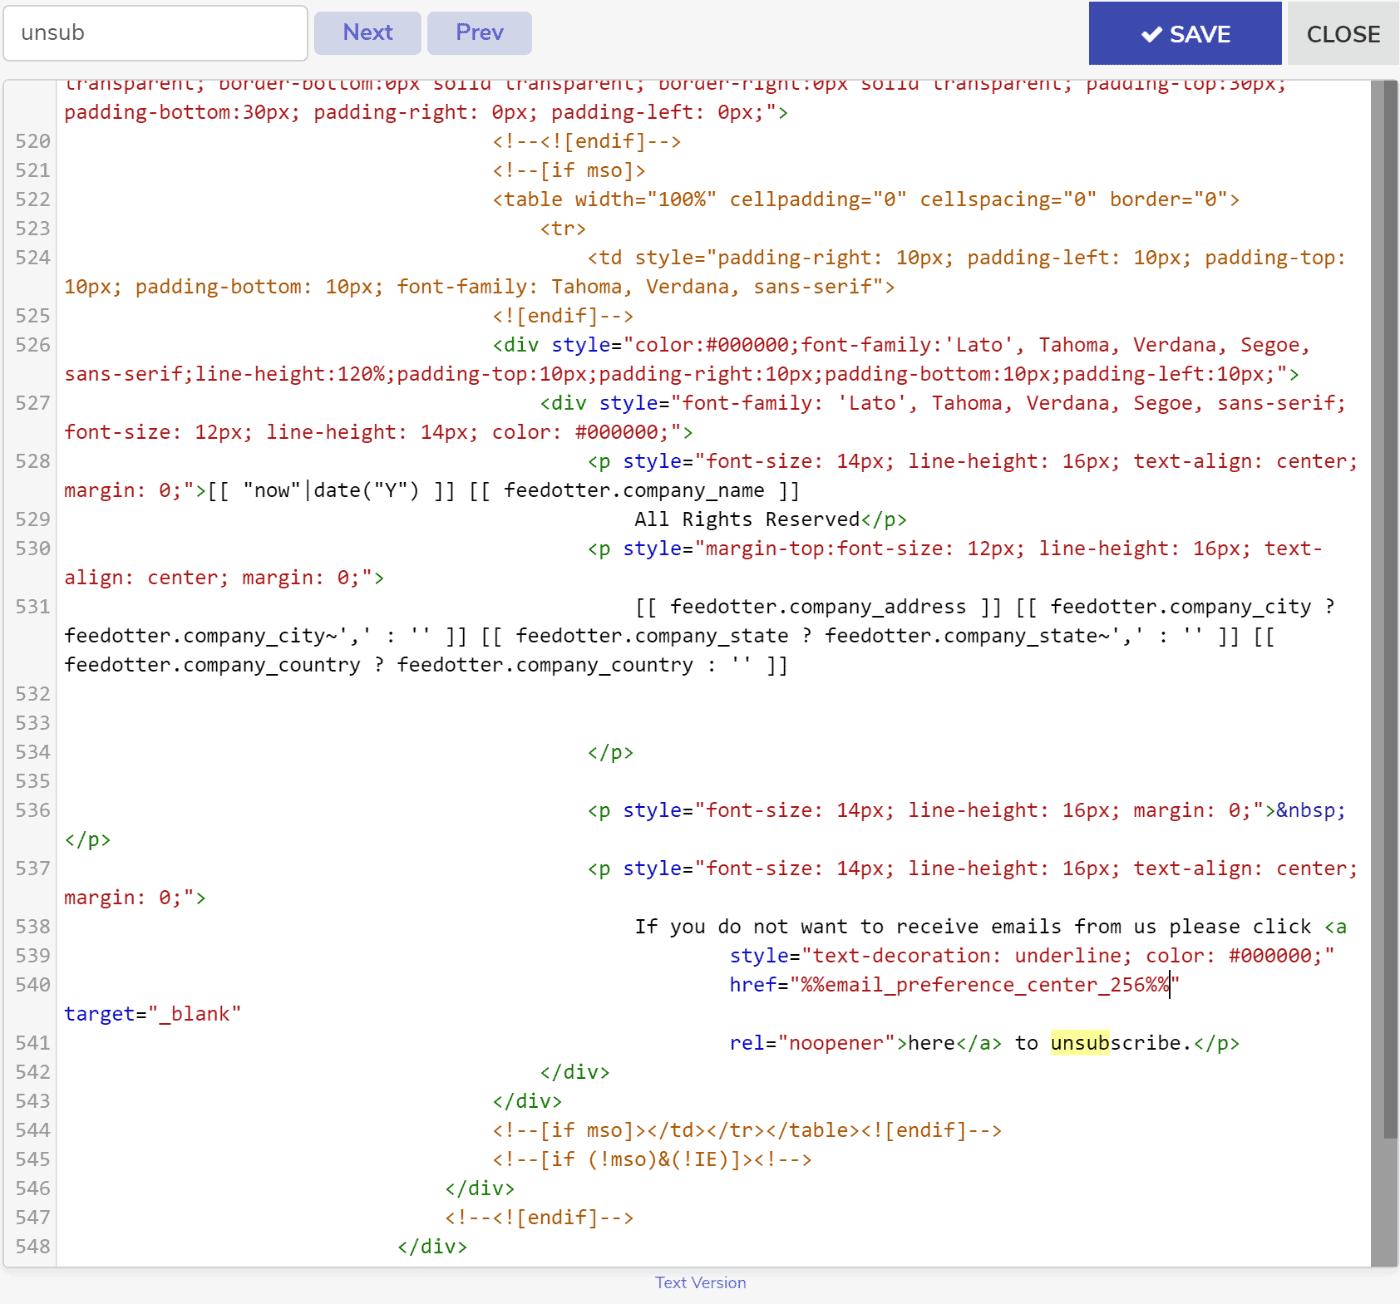 FeedOtter Code Window showing custom Pardot token